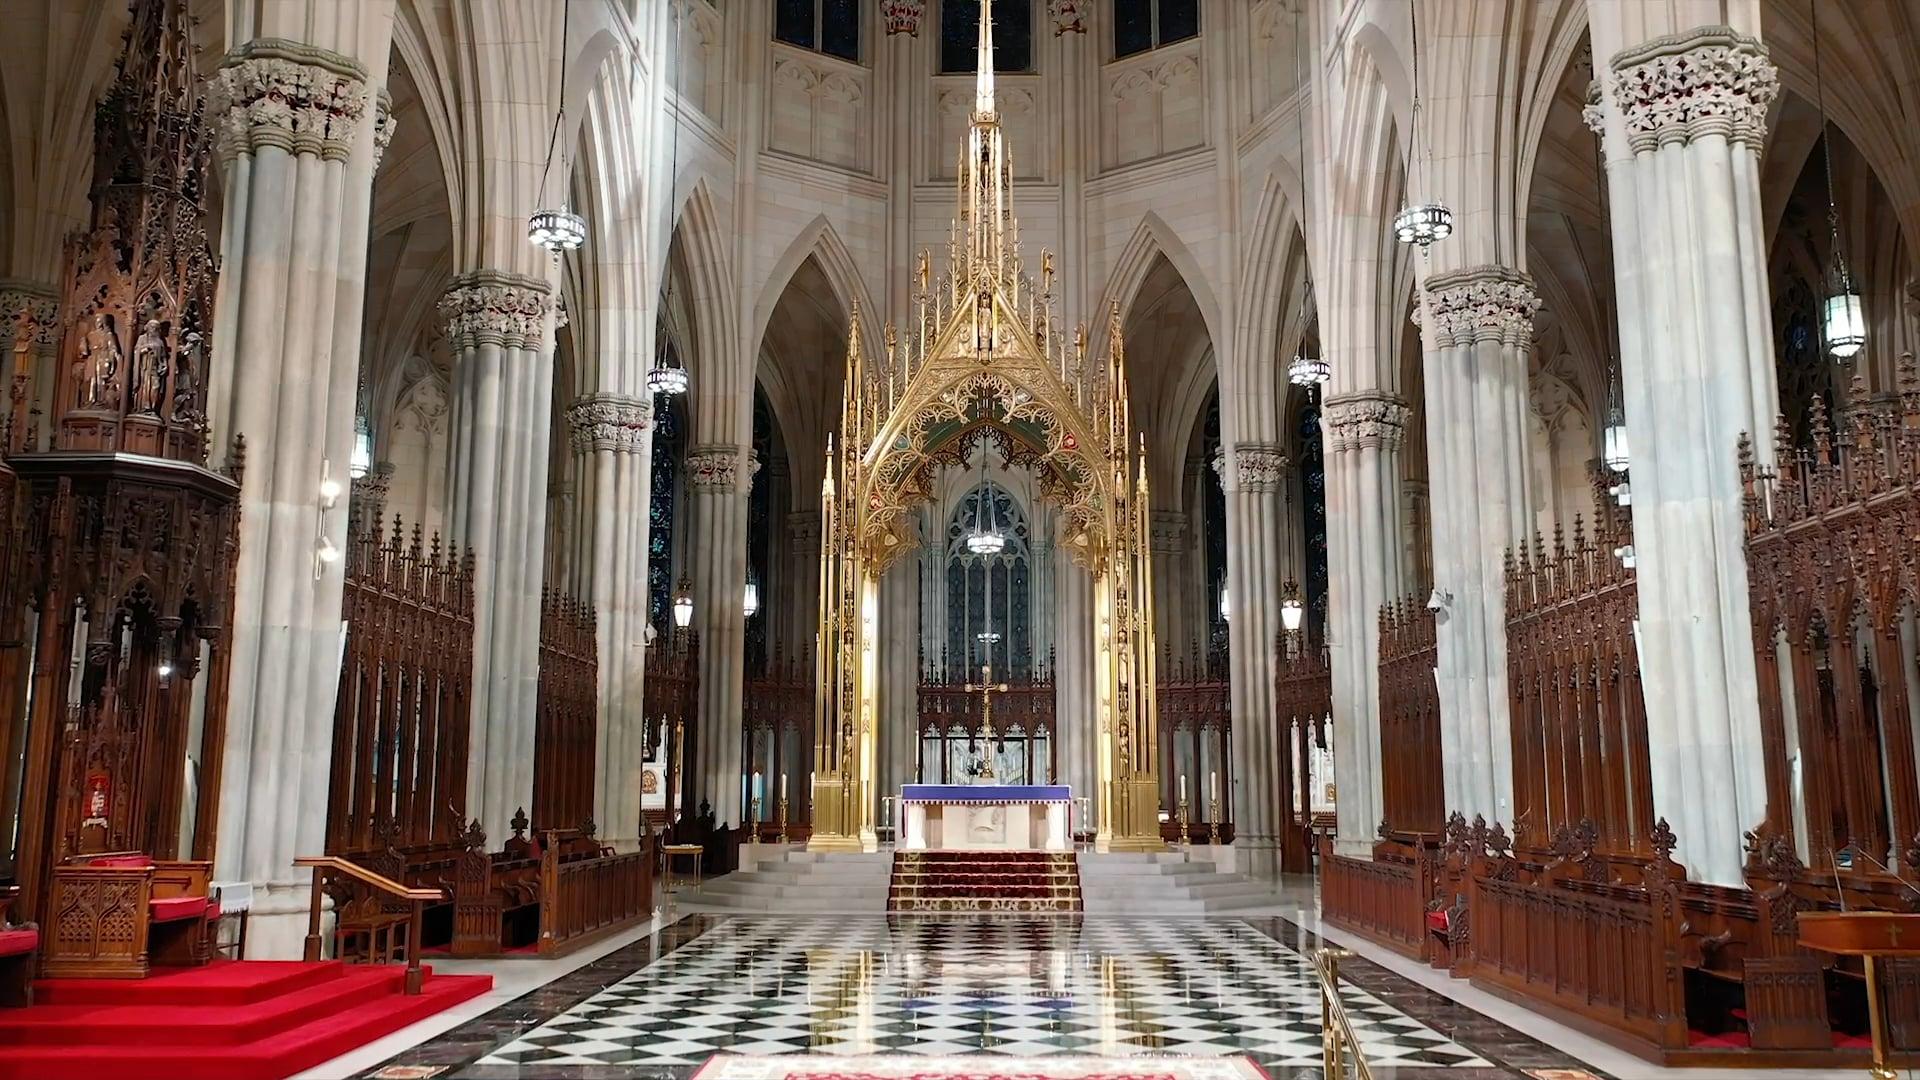 The Rosary: Joyful Mysteries led by Msgr. Joseph LaMorte